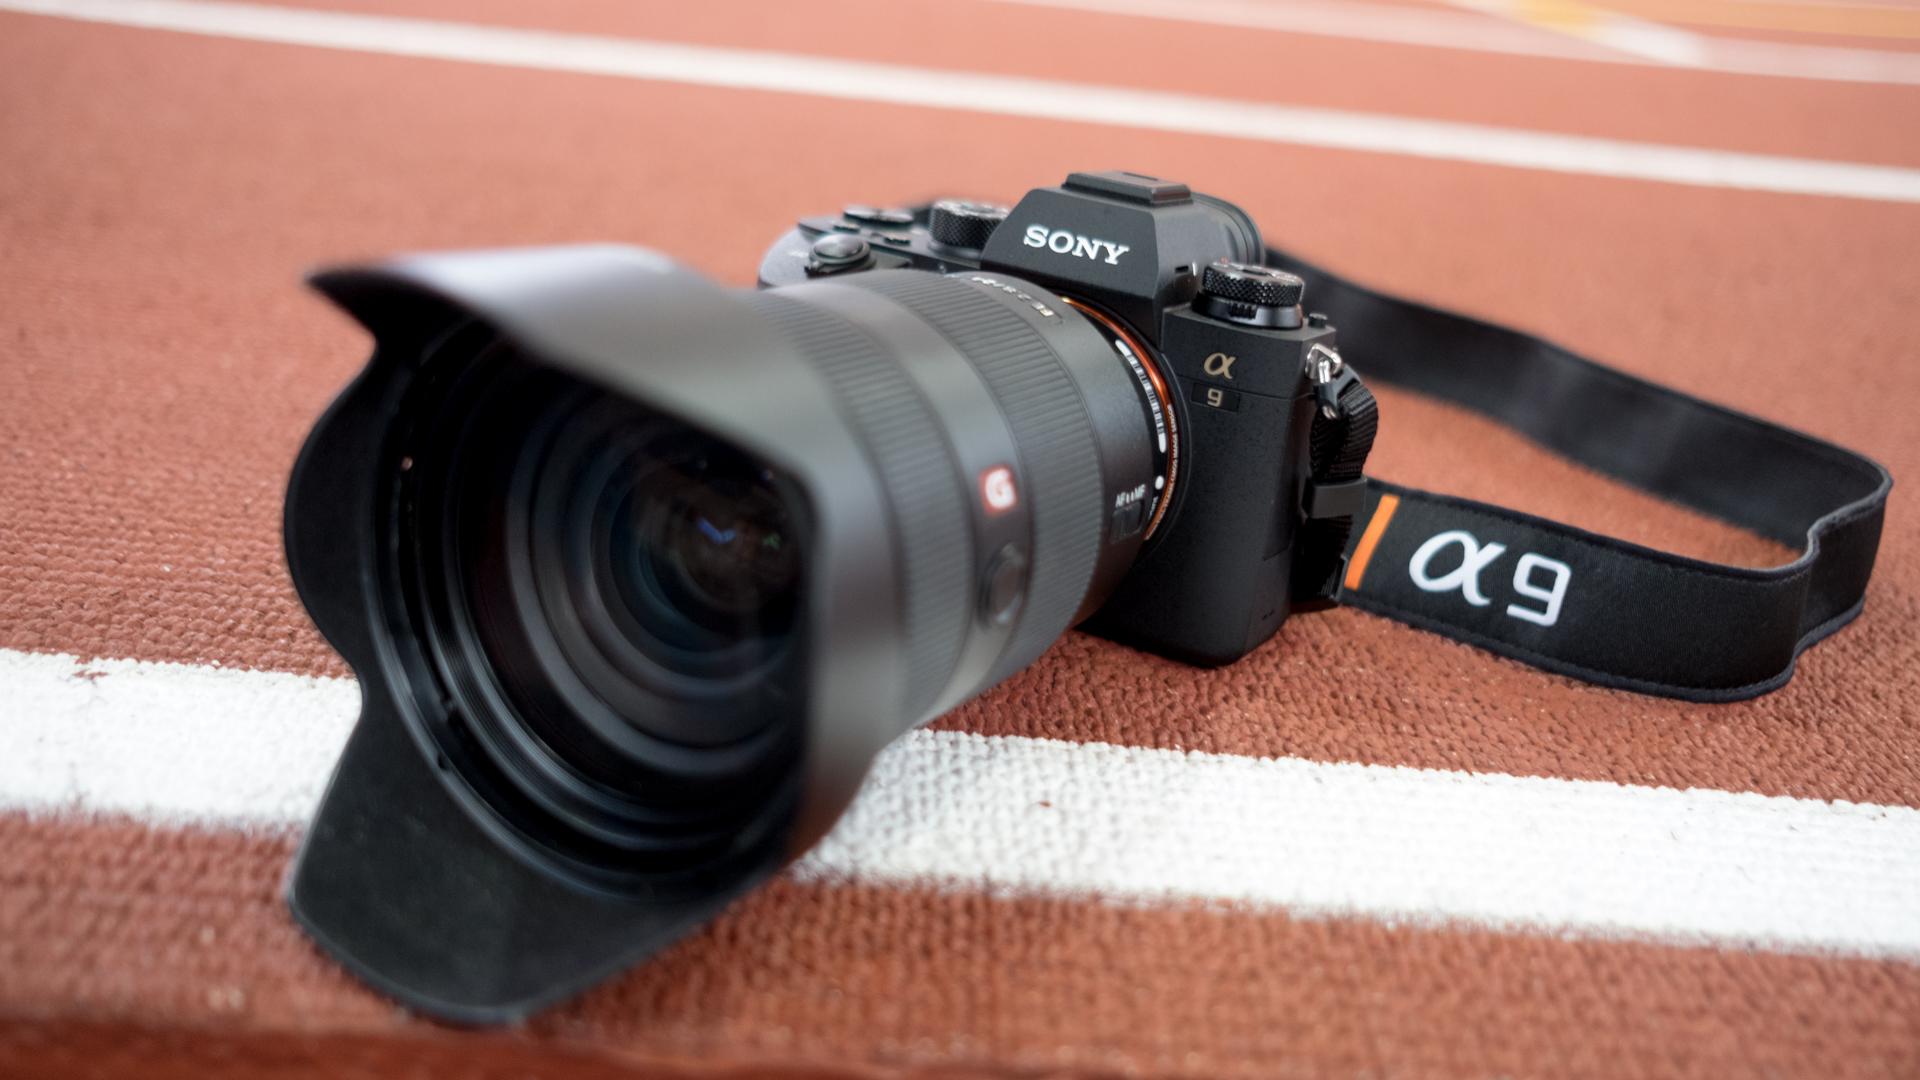 AApUkkTYfhgA6NxjvrEkdT - The 10 best full-frame mirrorless cameras in 2019